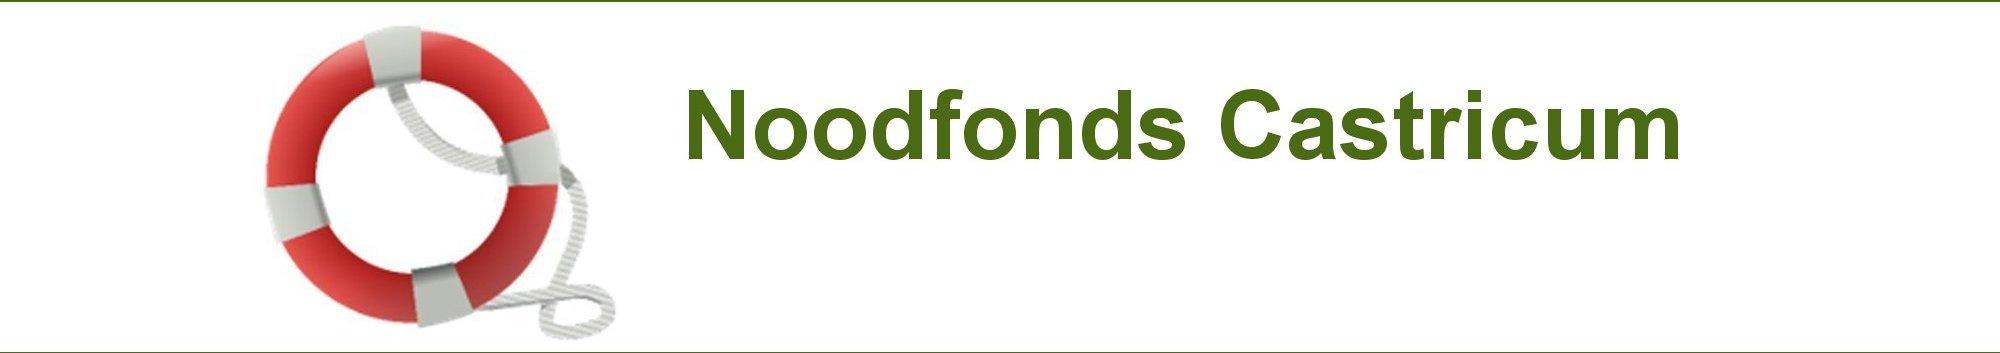 Noodfonds Castricum-Banner